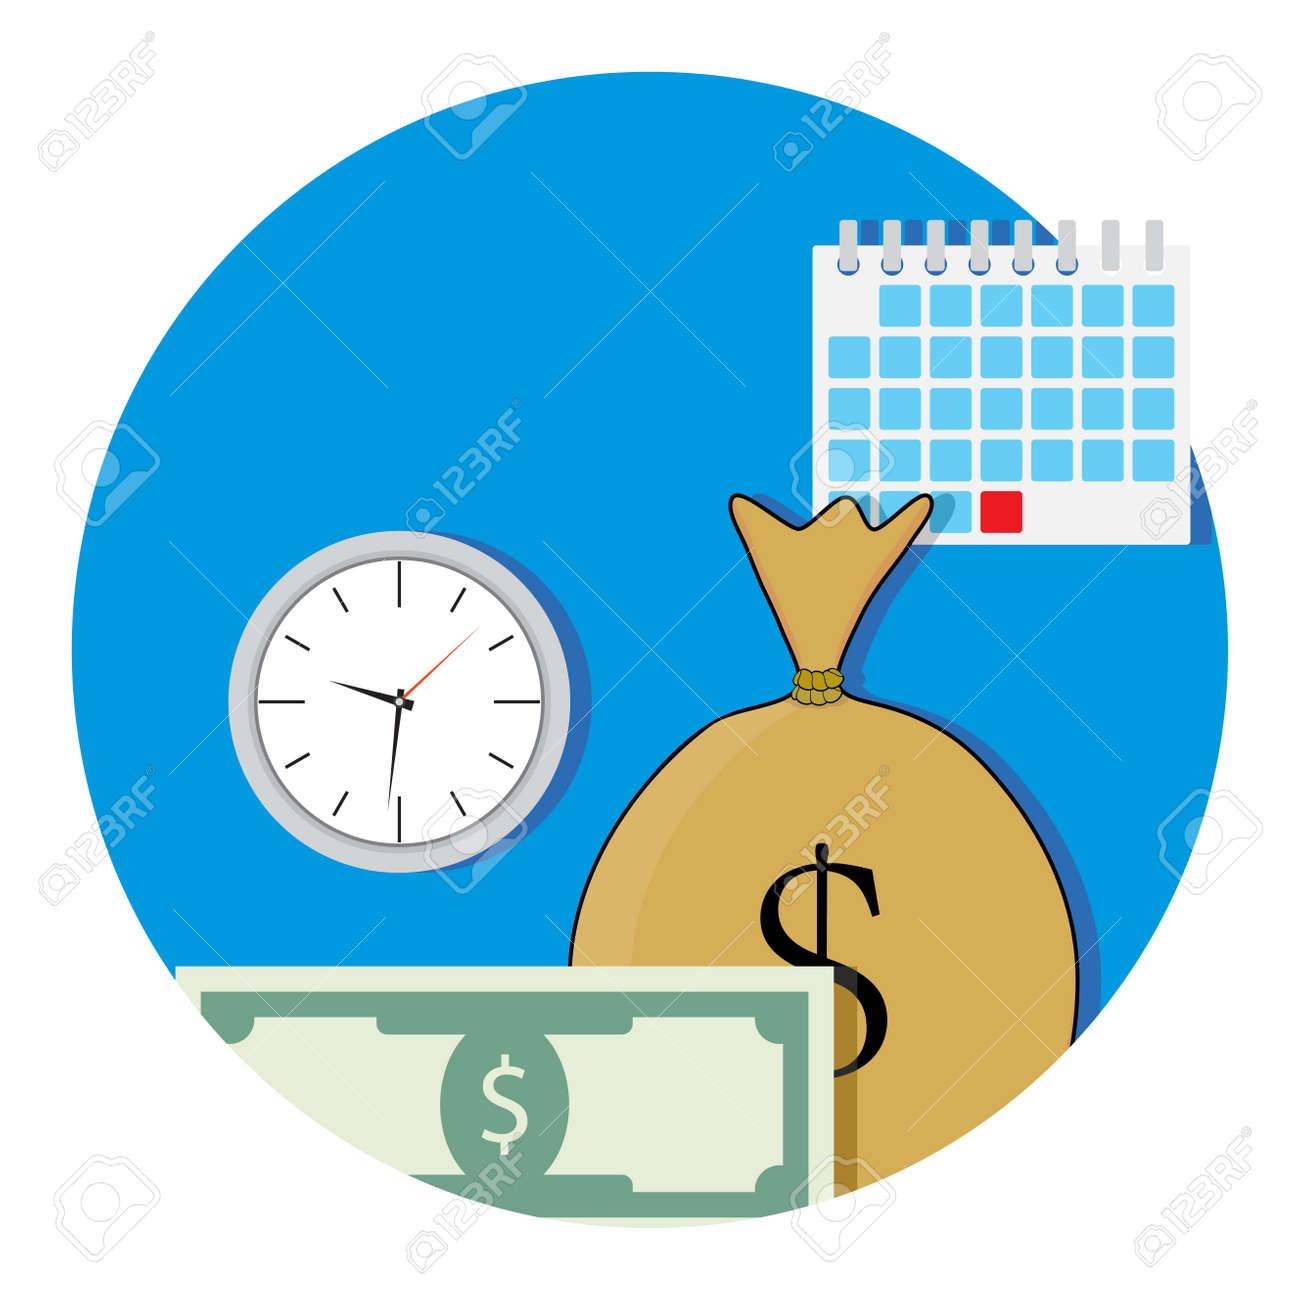 Salary fund